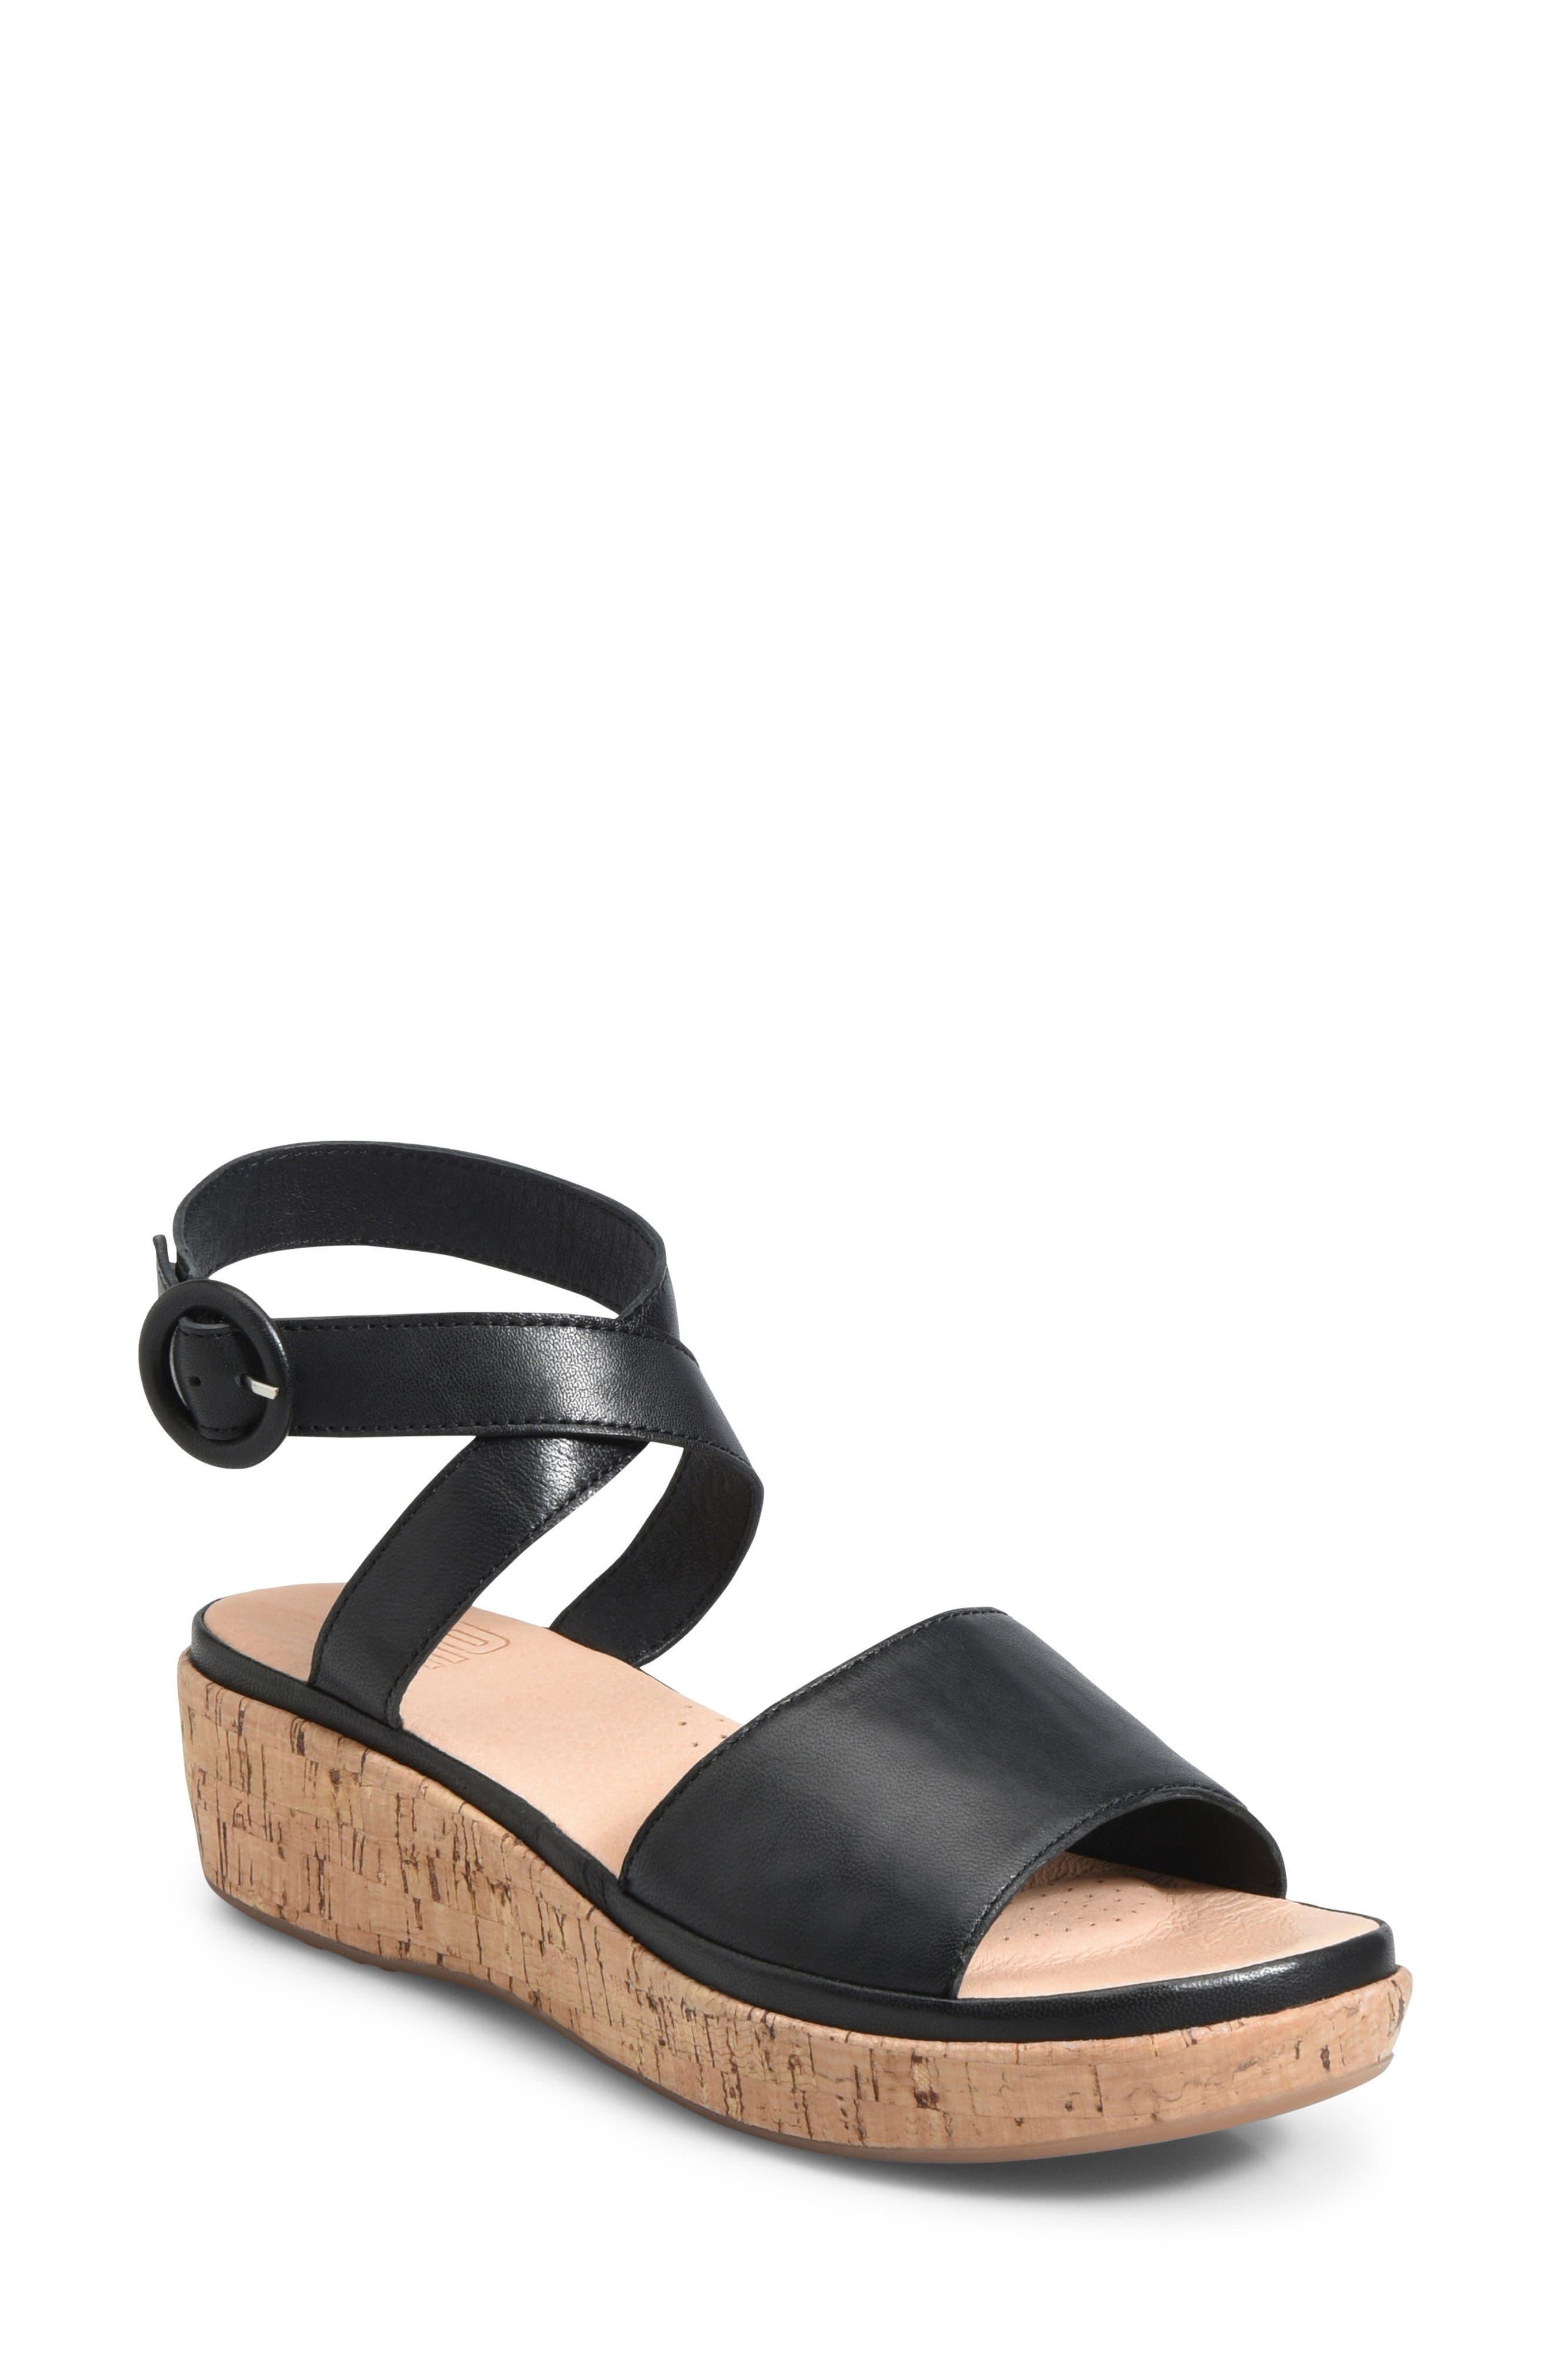 Dreamy Platform Wedge Sandal,                         Main,                         color, Black Leather